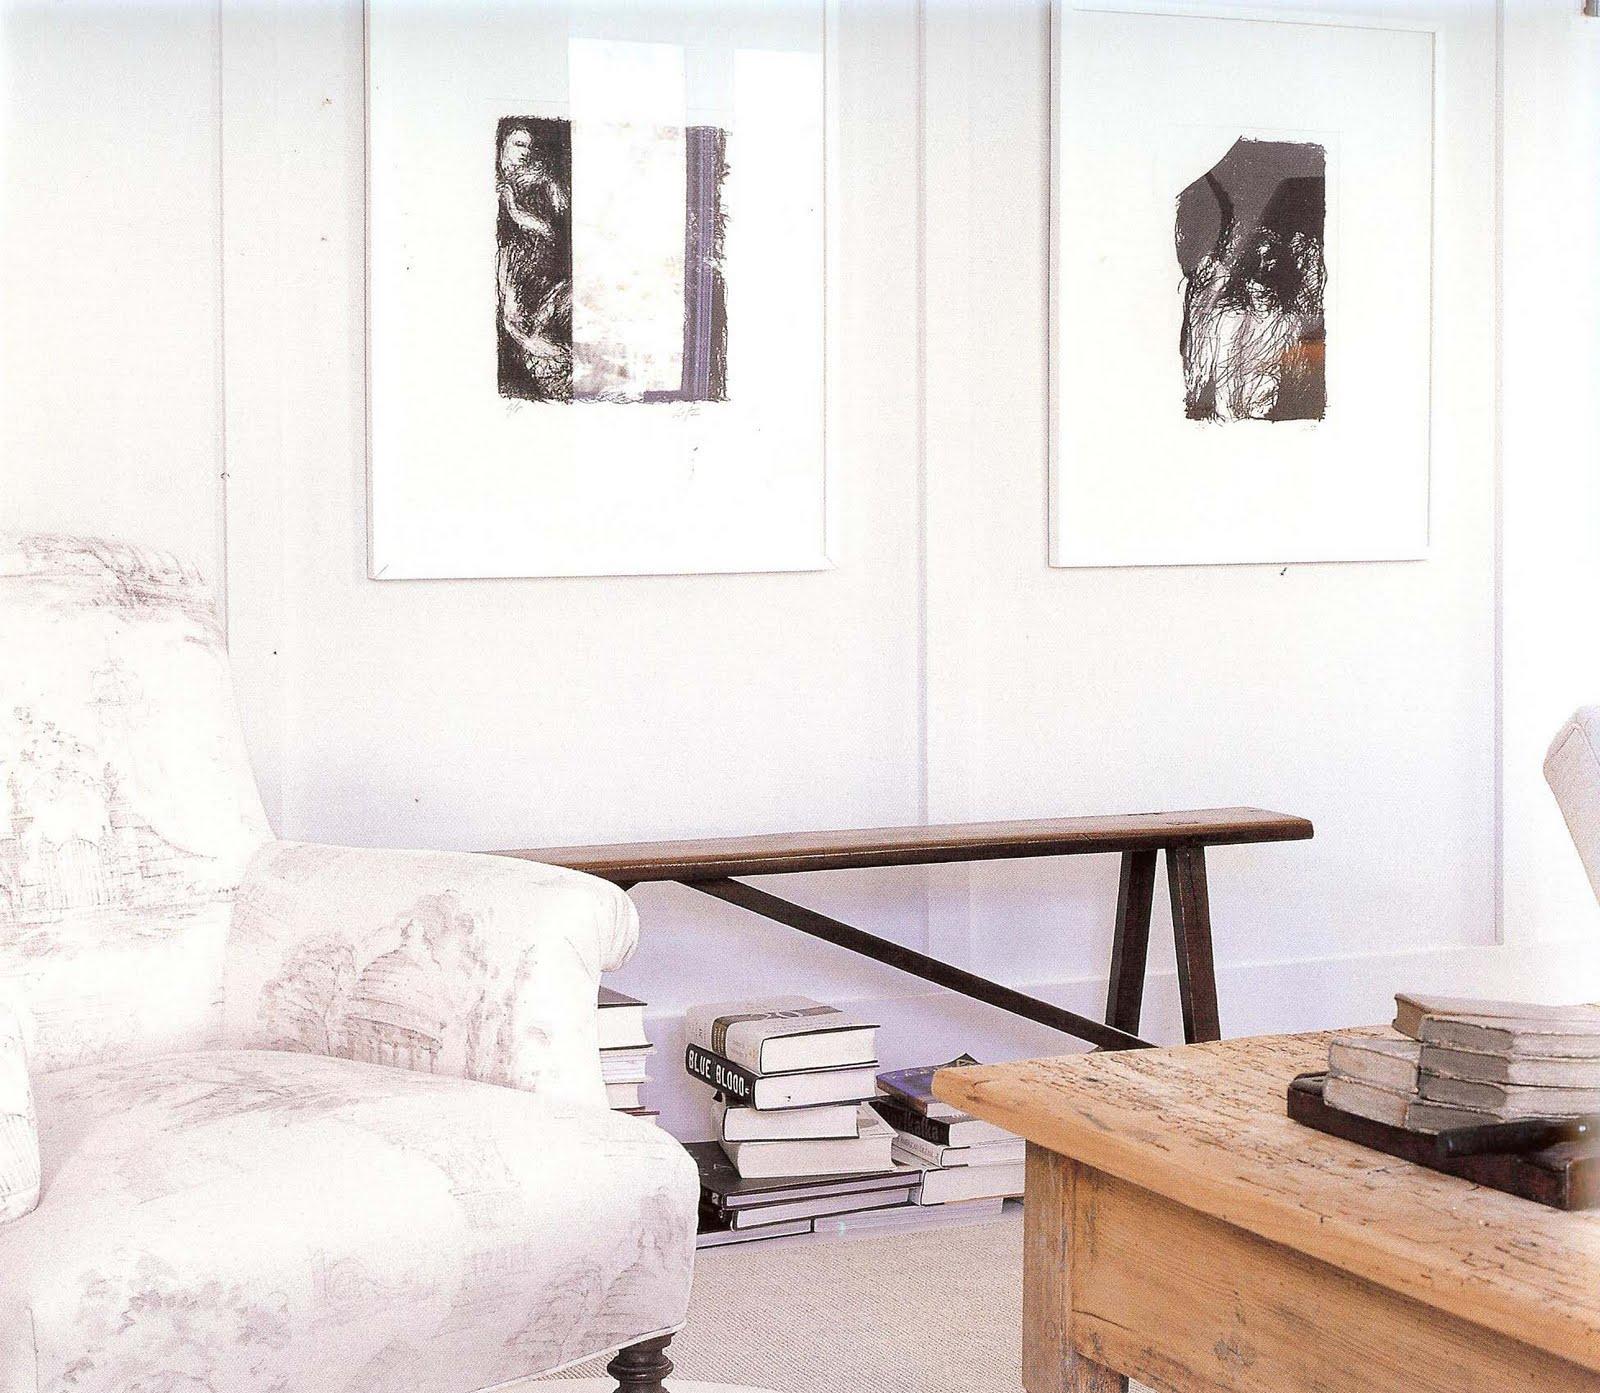 The board macrae designs blog darryl carter for Darryl carter furniture collection